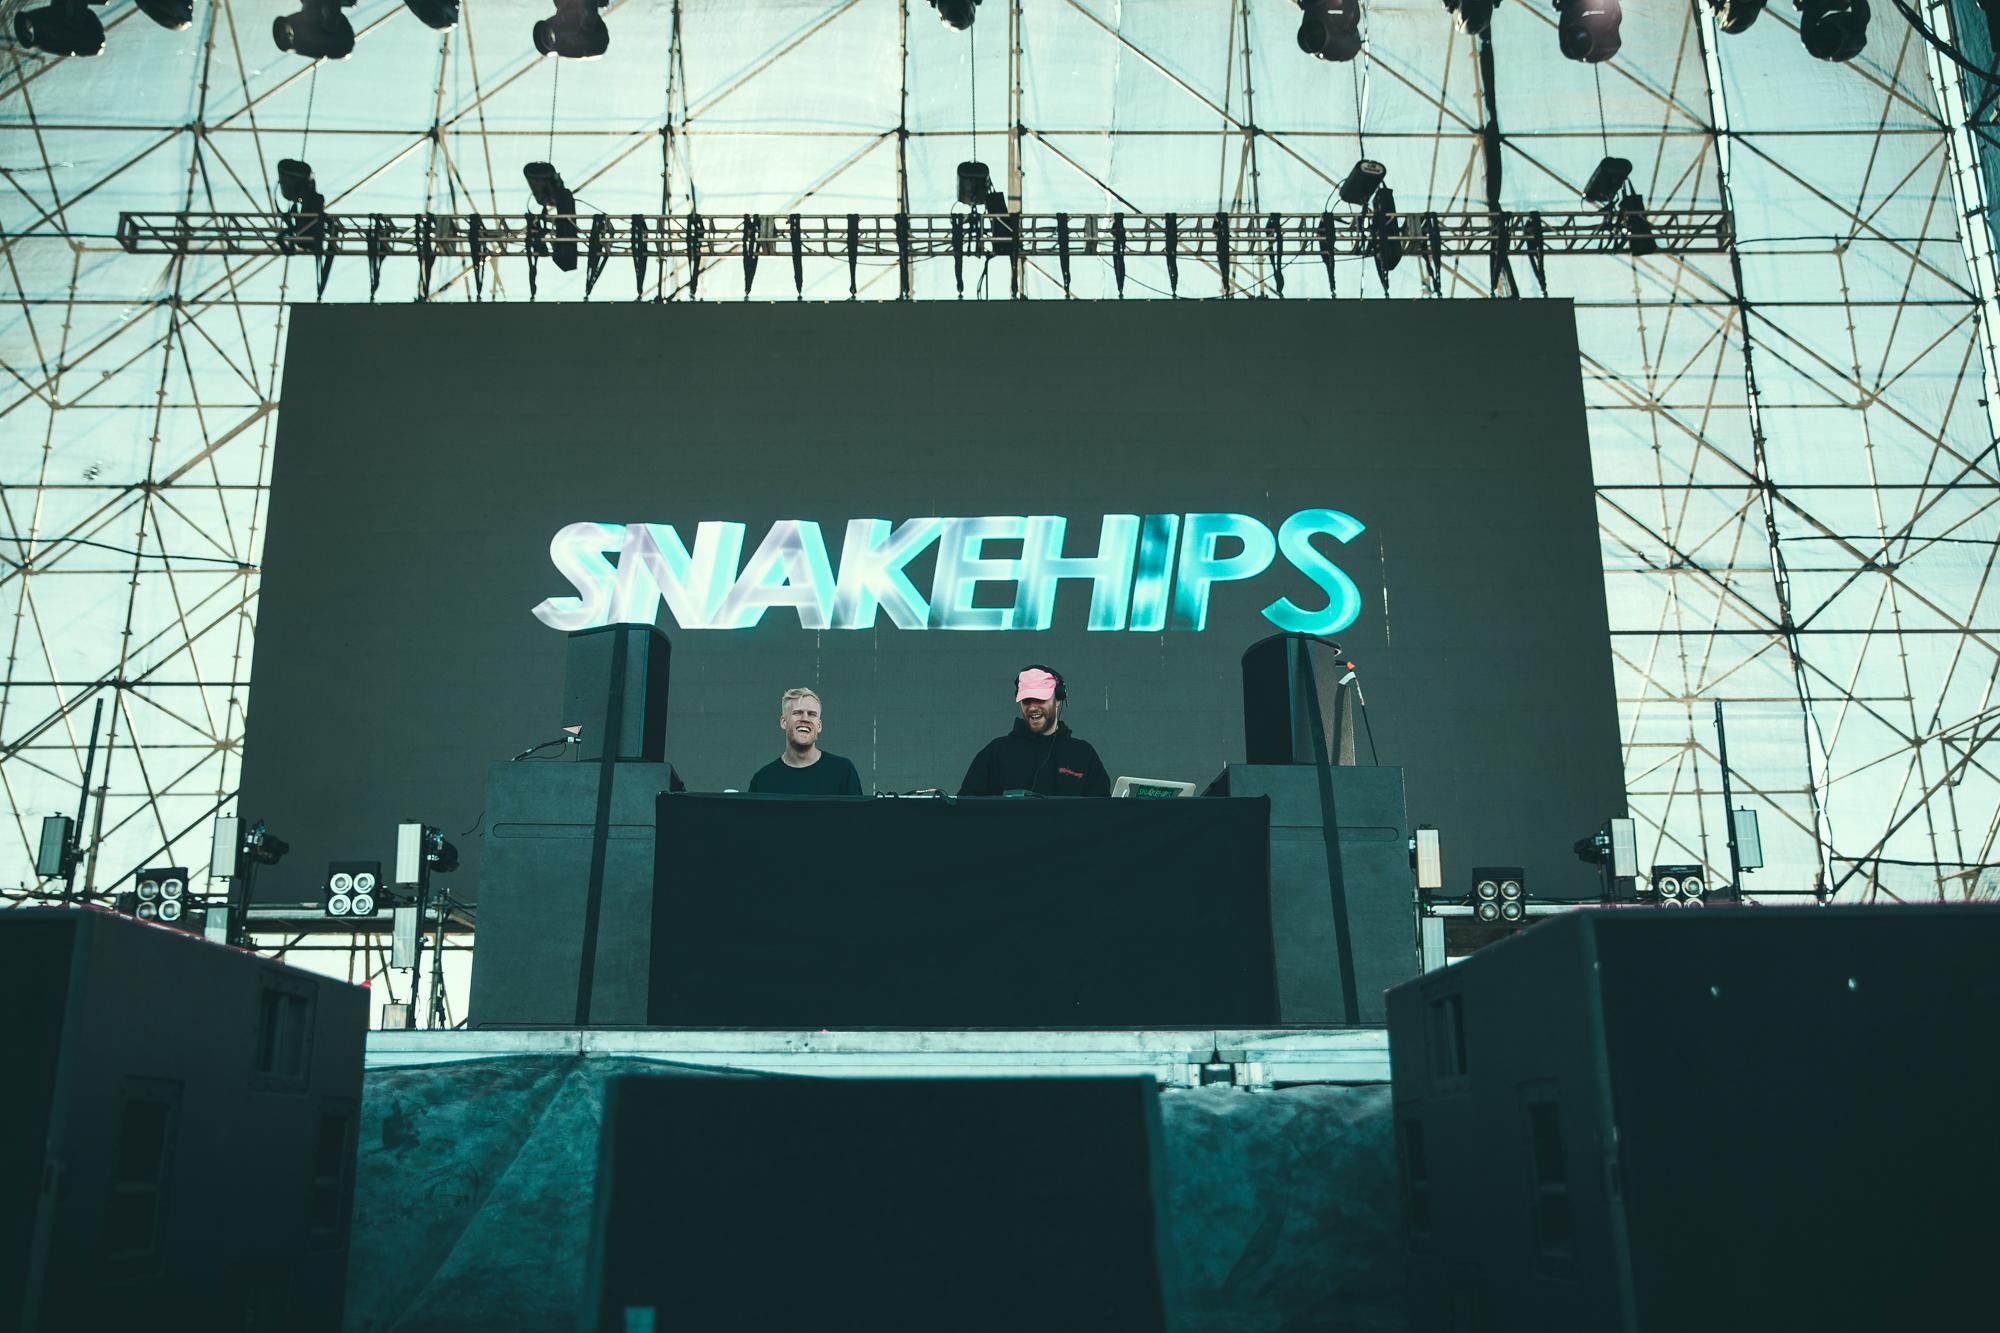 Snakeships-Festival Ceremonia-Mexico-Foro Pegaso-04.02.2017-Daniel Patlan_Desde 1989 (1 of 7).jpg